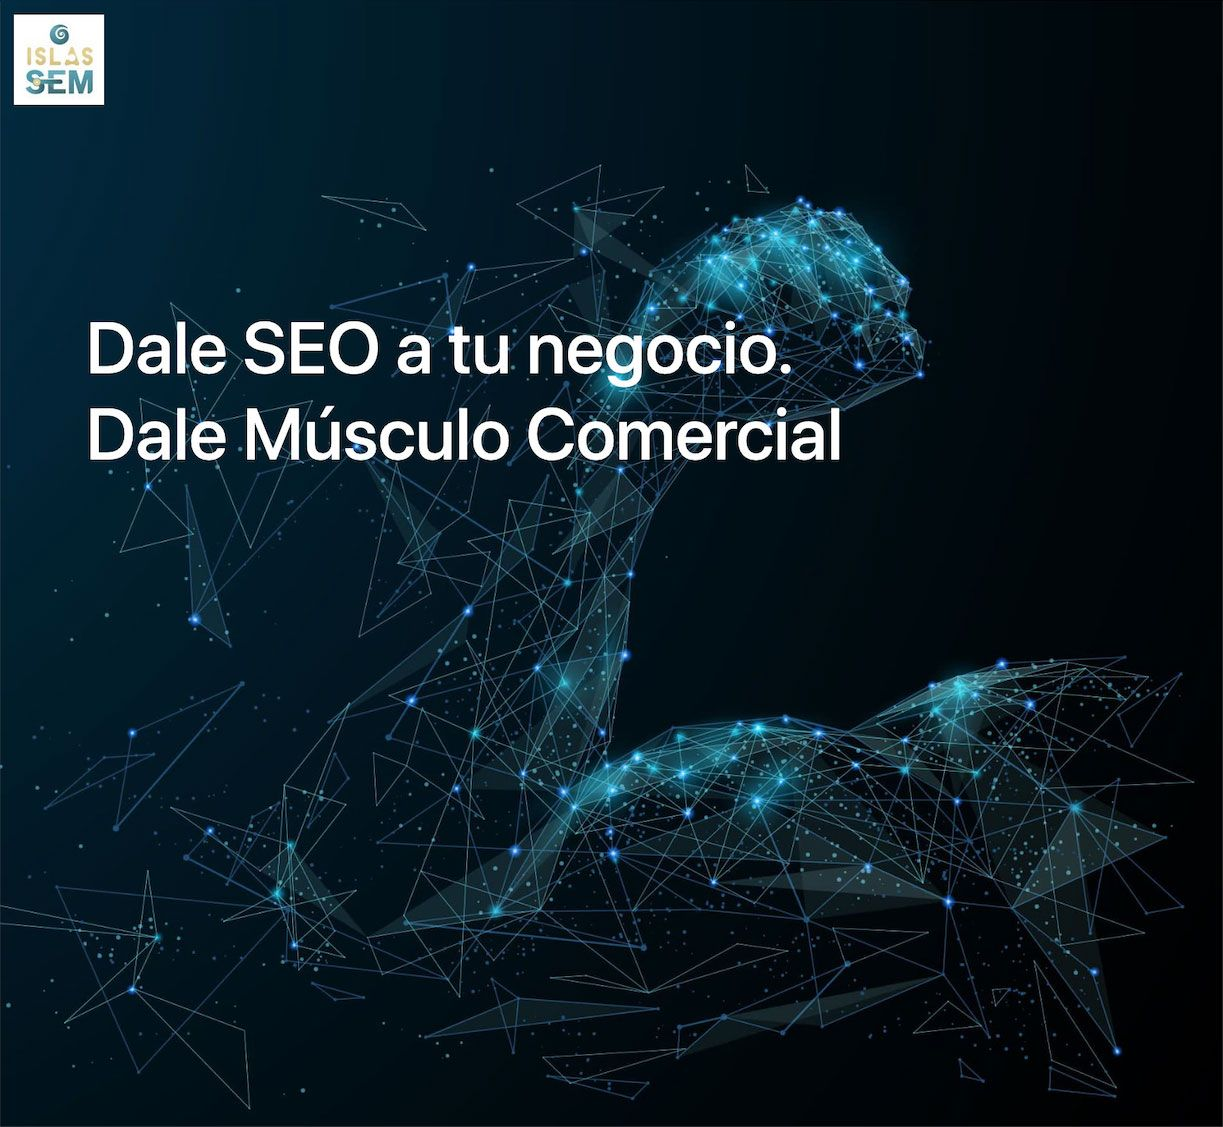 Posicionamiento Web en Las Palmas: Islas SEM